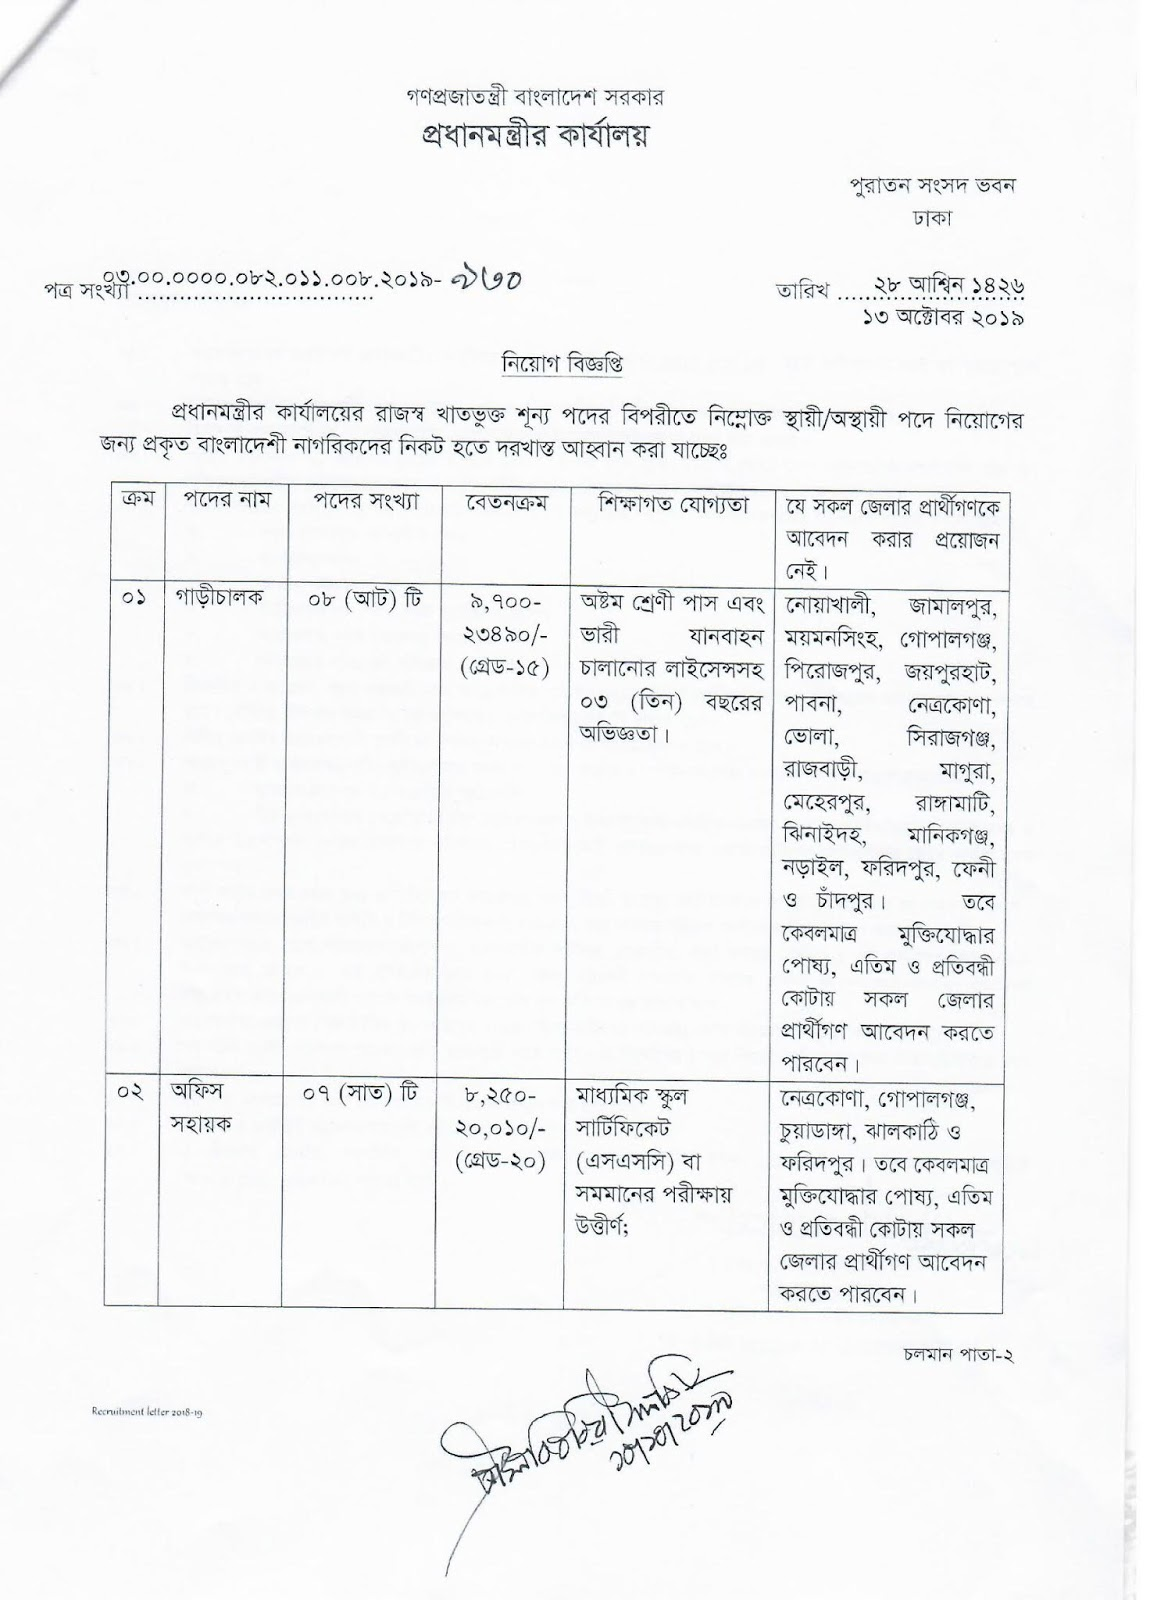 Prime Ministers Office Job Circular 2019